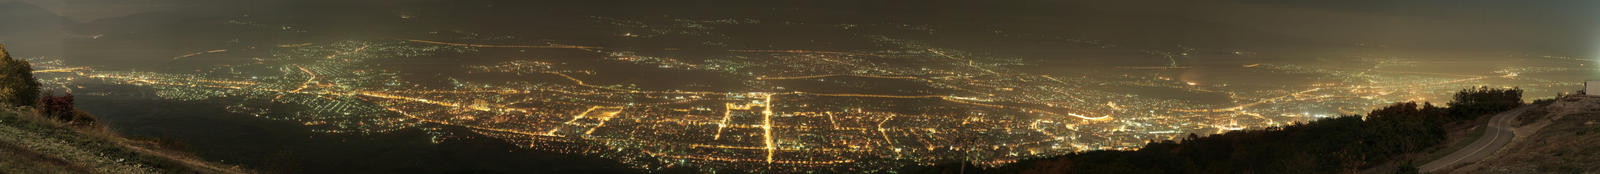 The name is Skopje